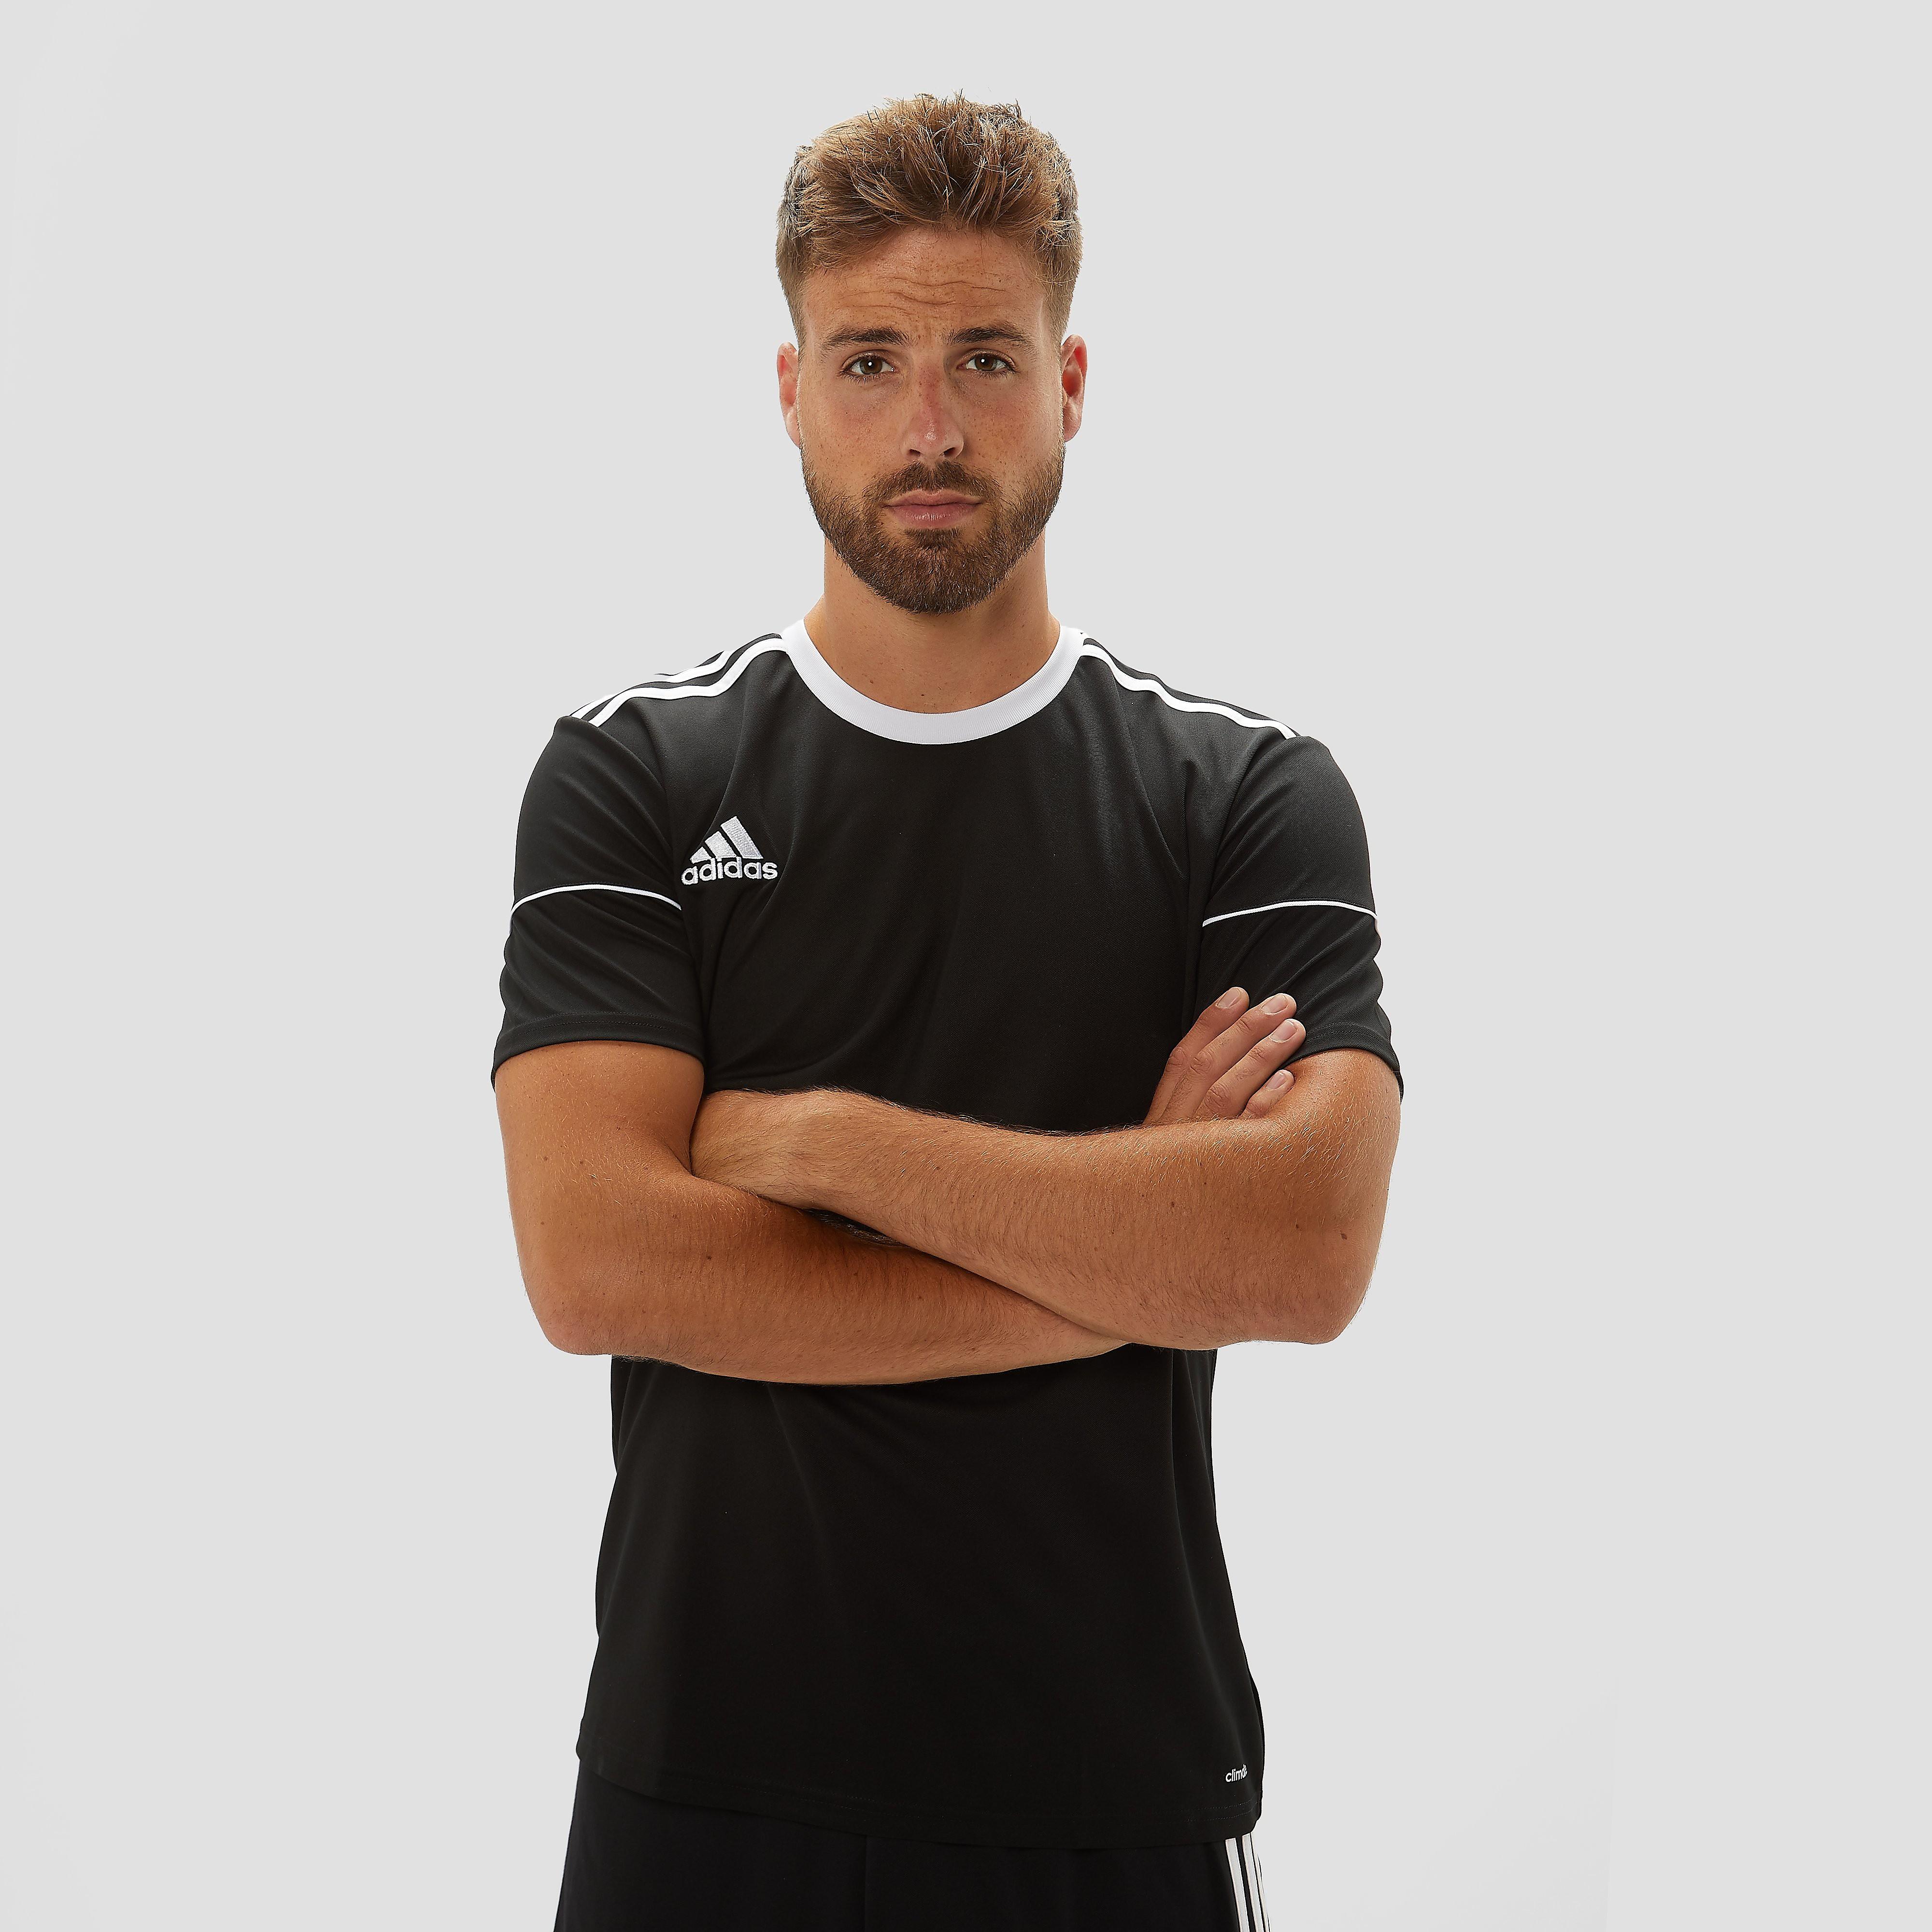 adidas Squad 17 voetbalshirt zwart heren Heren